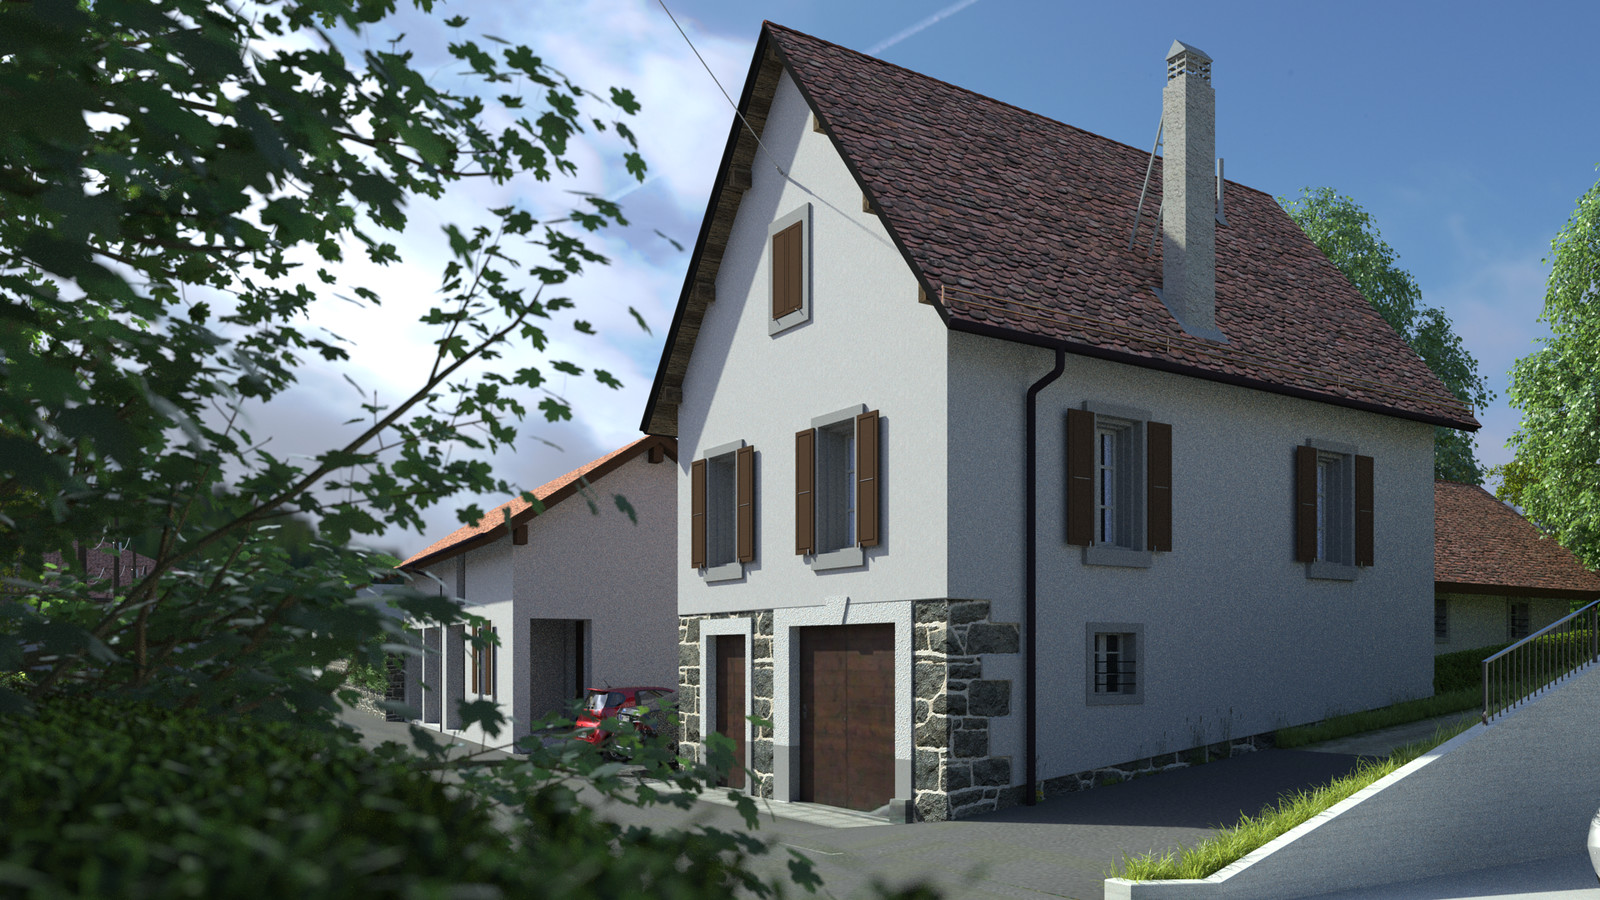 SketchUp + Thea Render  Little Swiss House Scene 28 Dosche skiesv2_25_XXL 01 HD 1920 x 1080 Presto MC